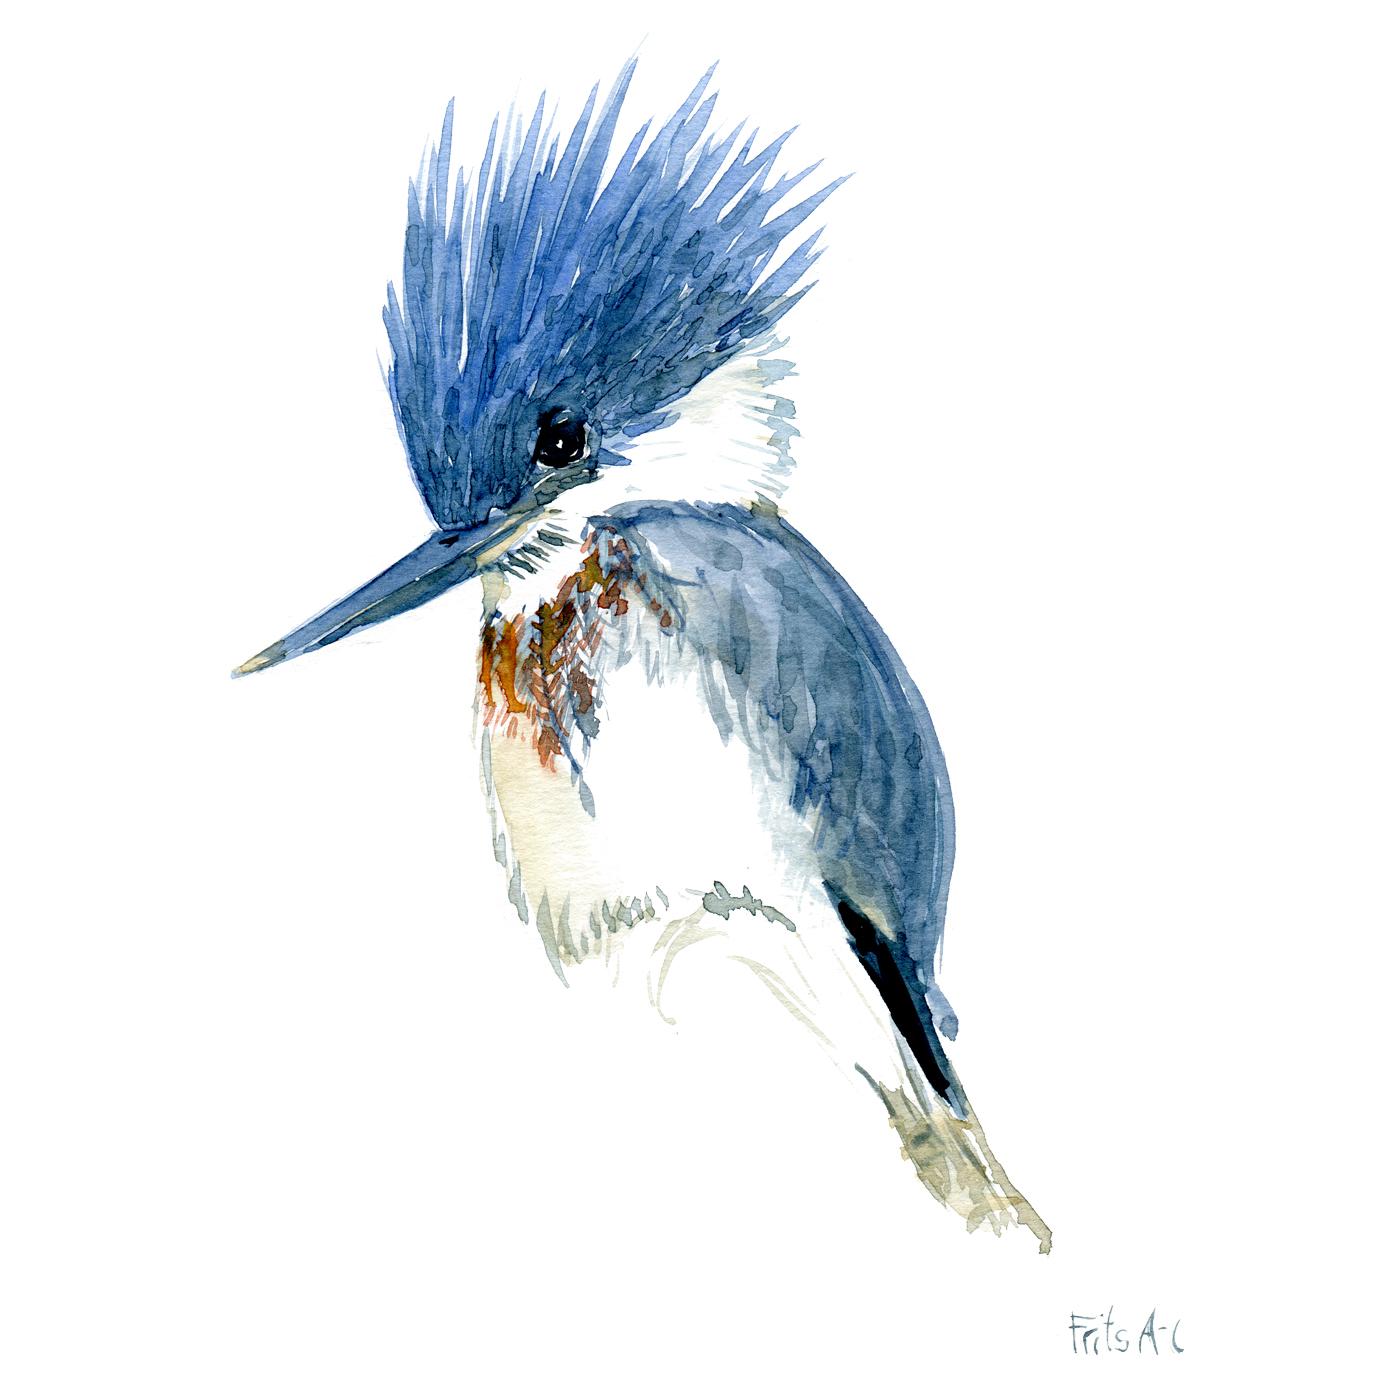 Illustration of Kingfisher by Frits Ahlefeldt